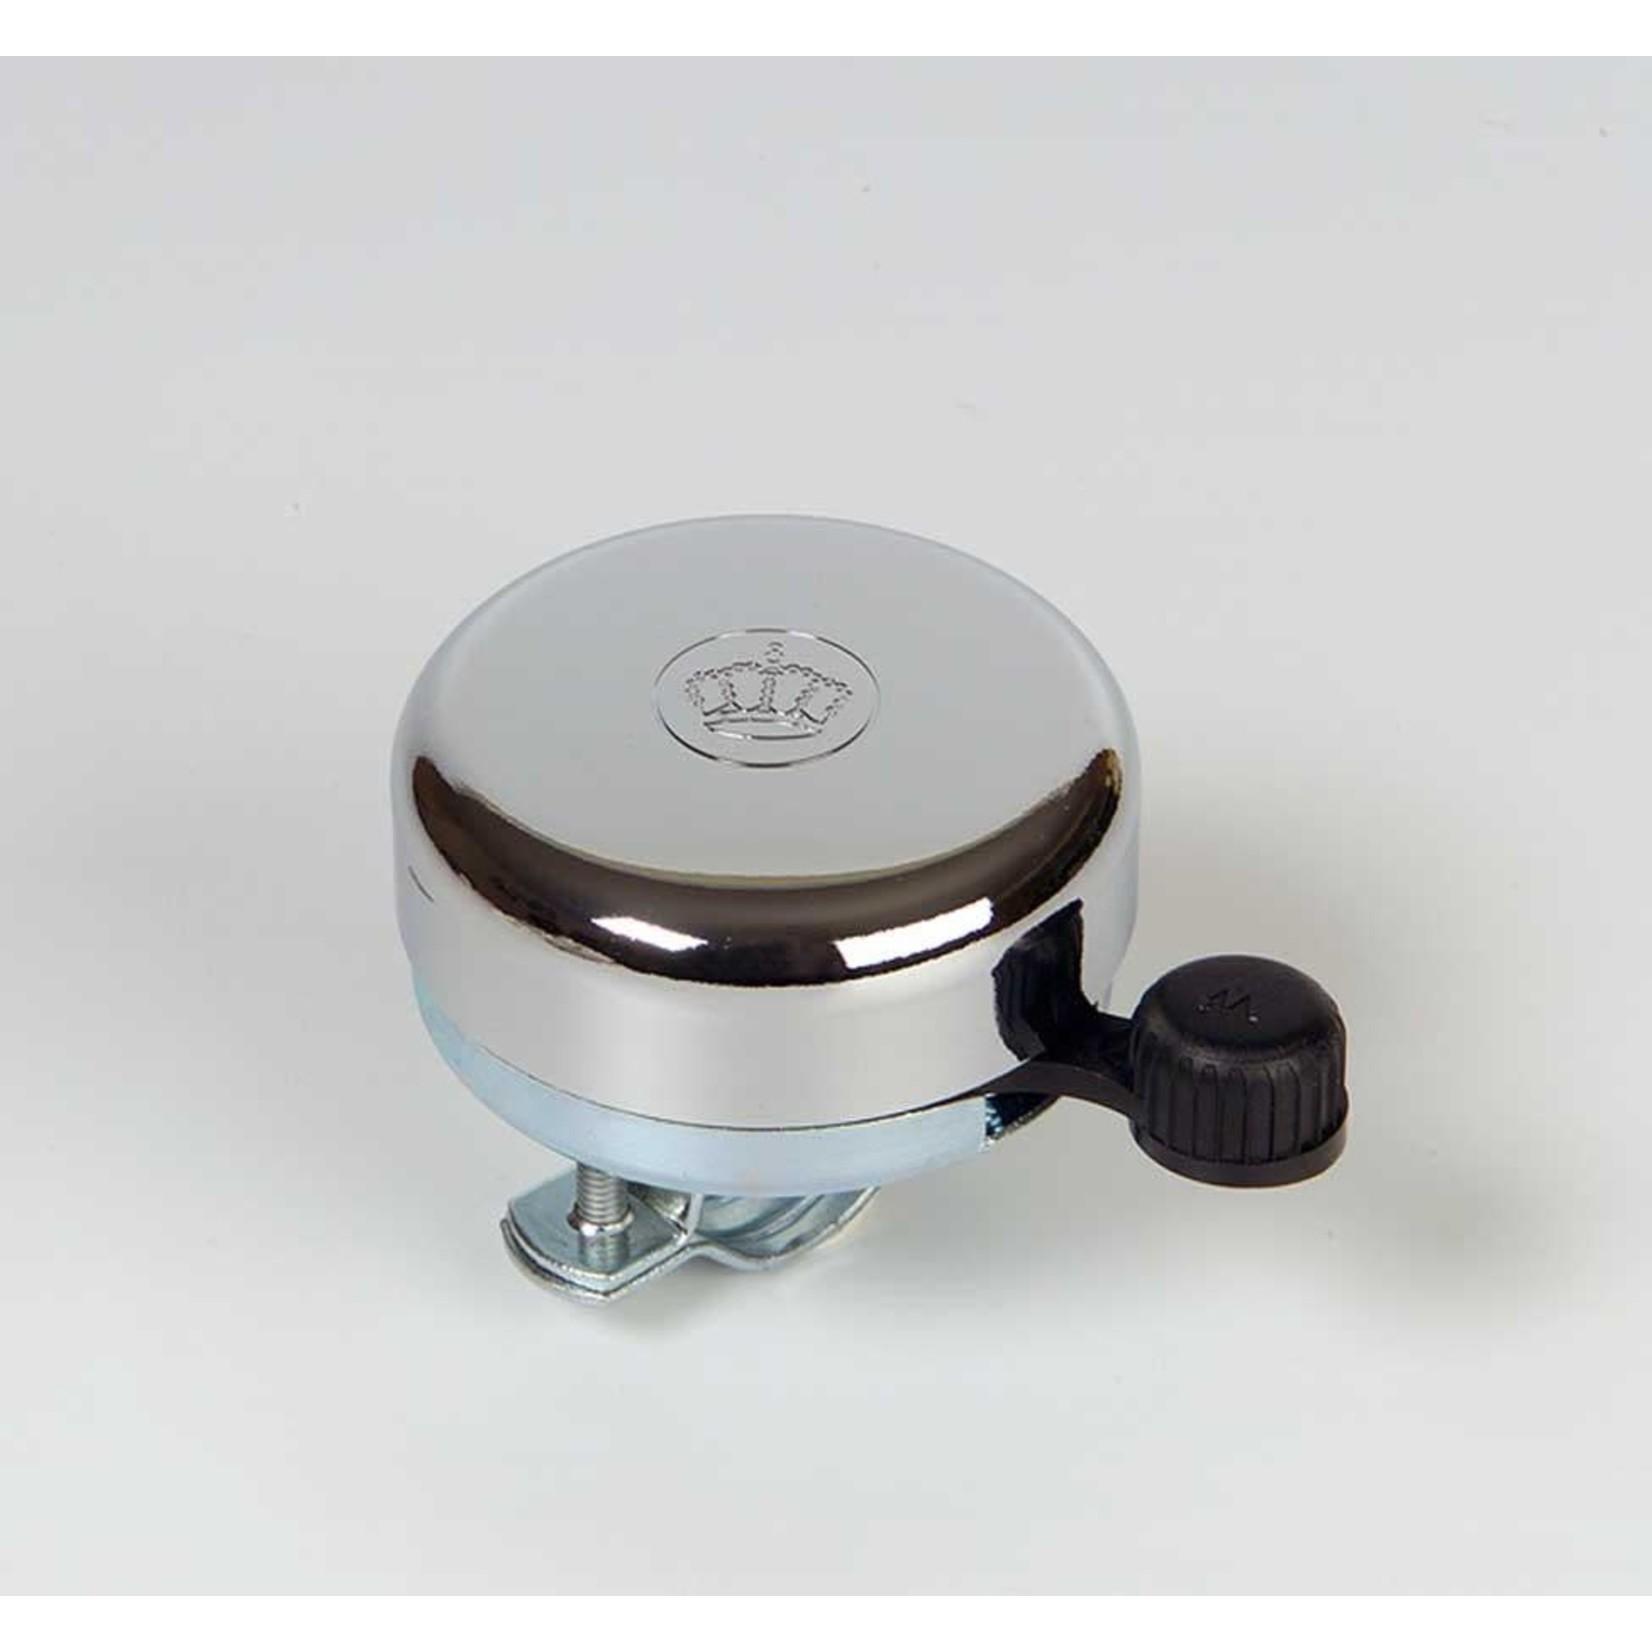 Widek Steel Bell - Chrome